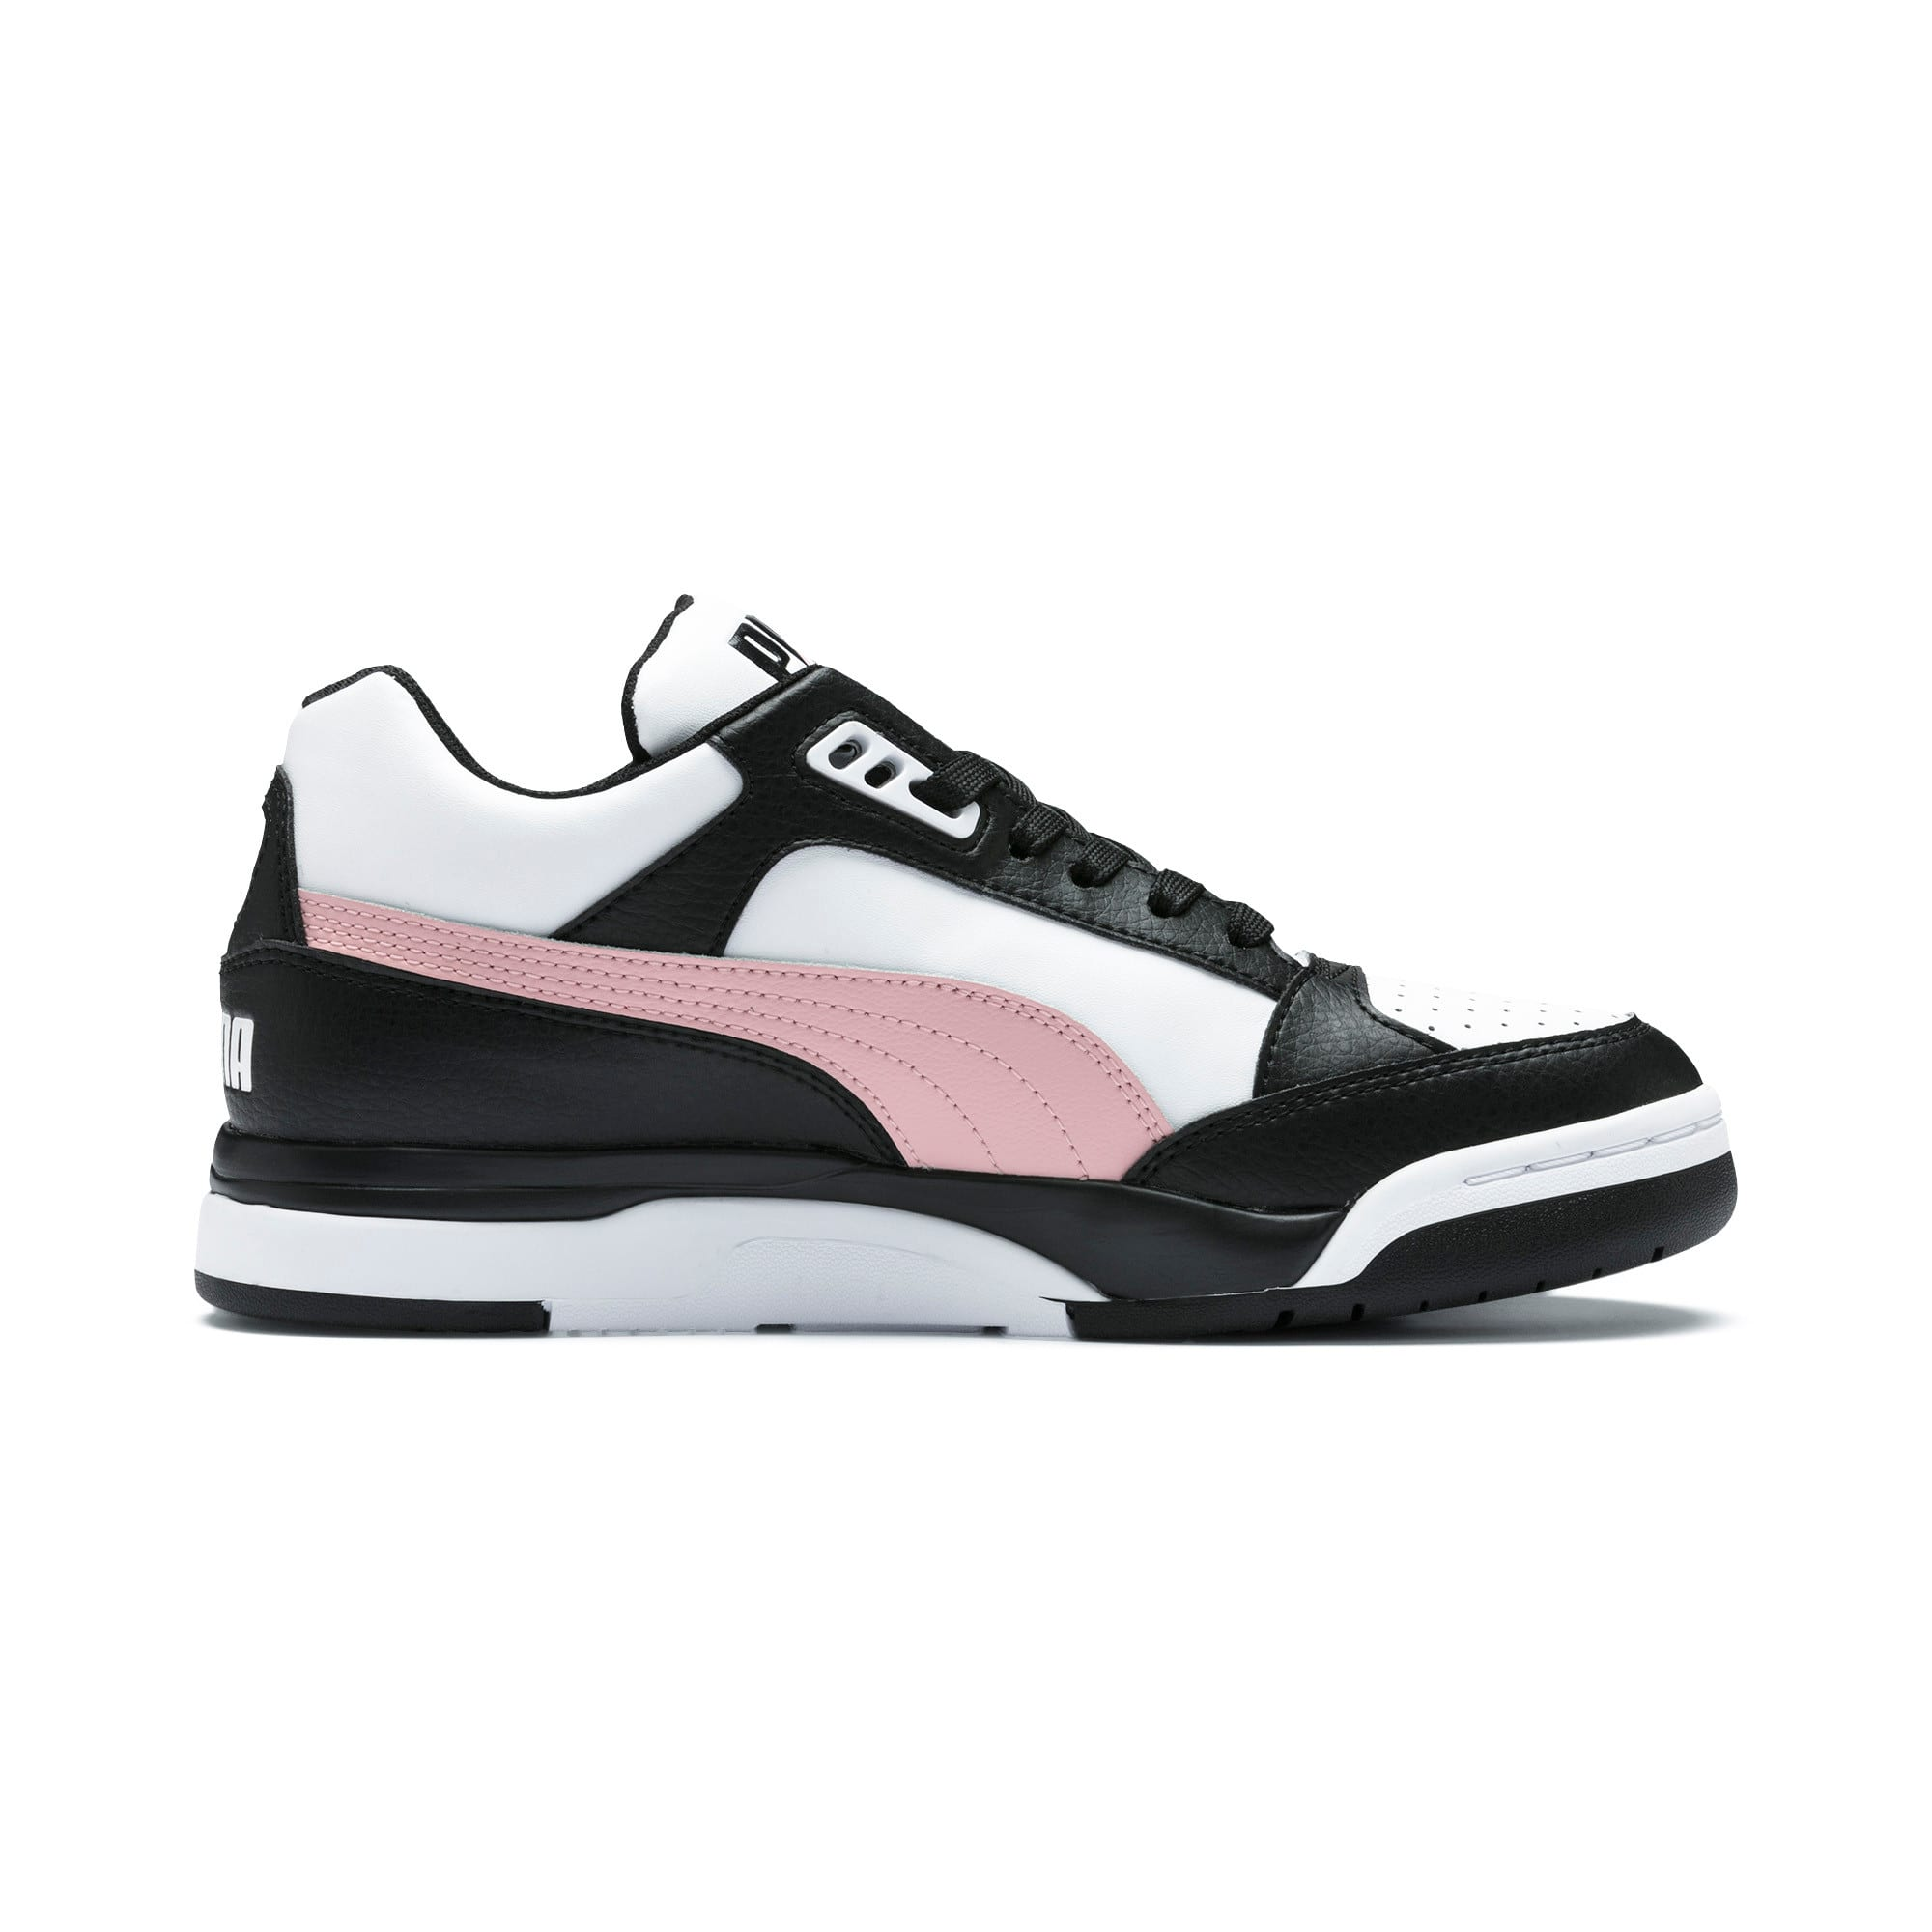 Thumbnail 6 of Palace Guard Colorblock Women's Sneakers, Puma Black-Puma White, medium